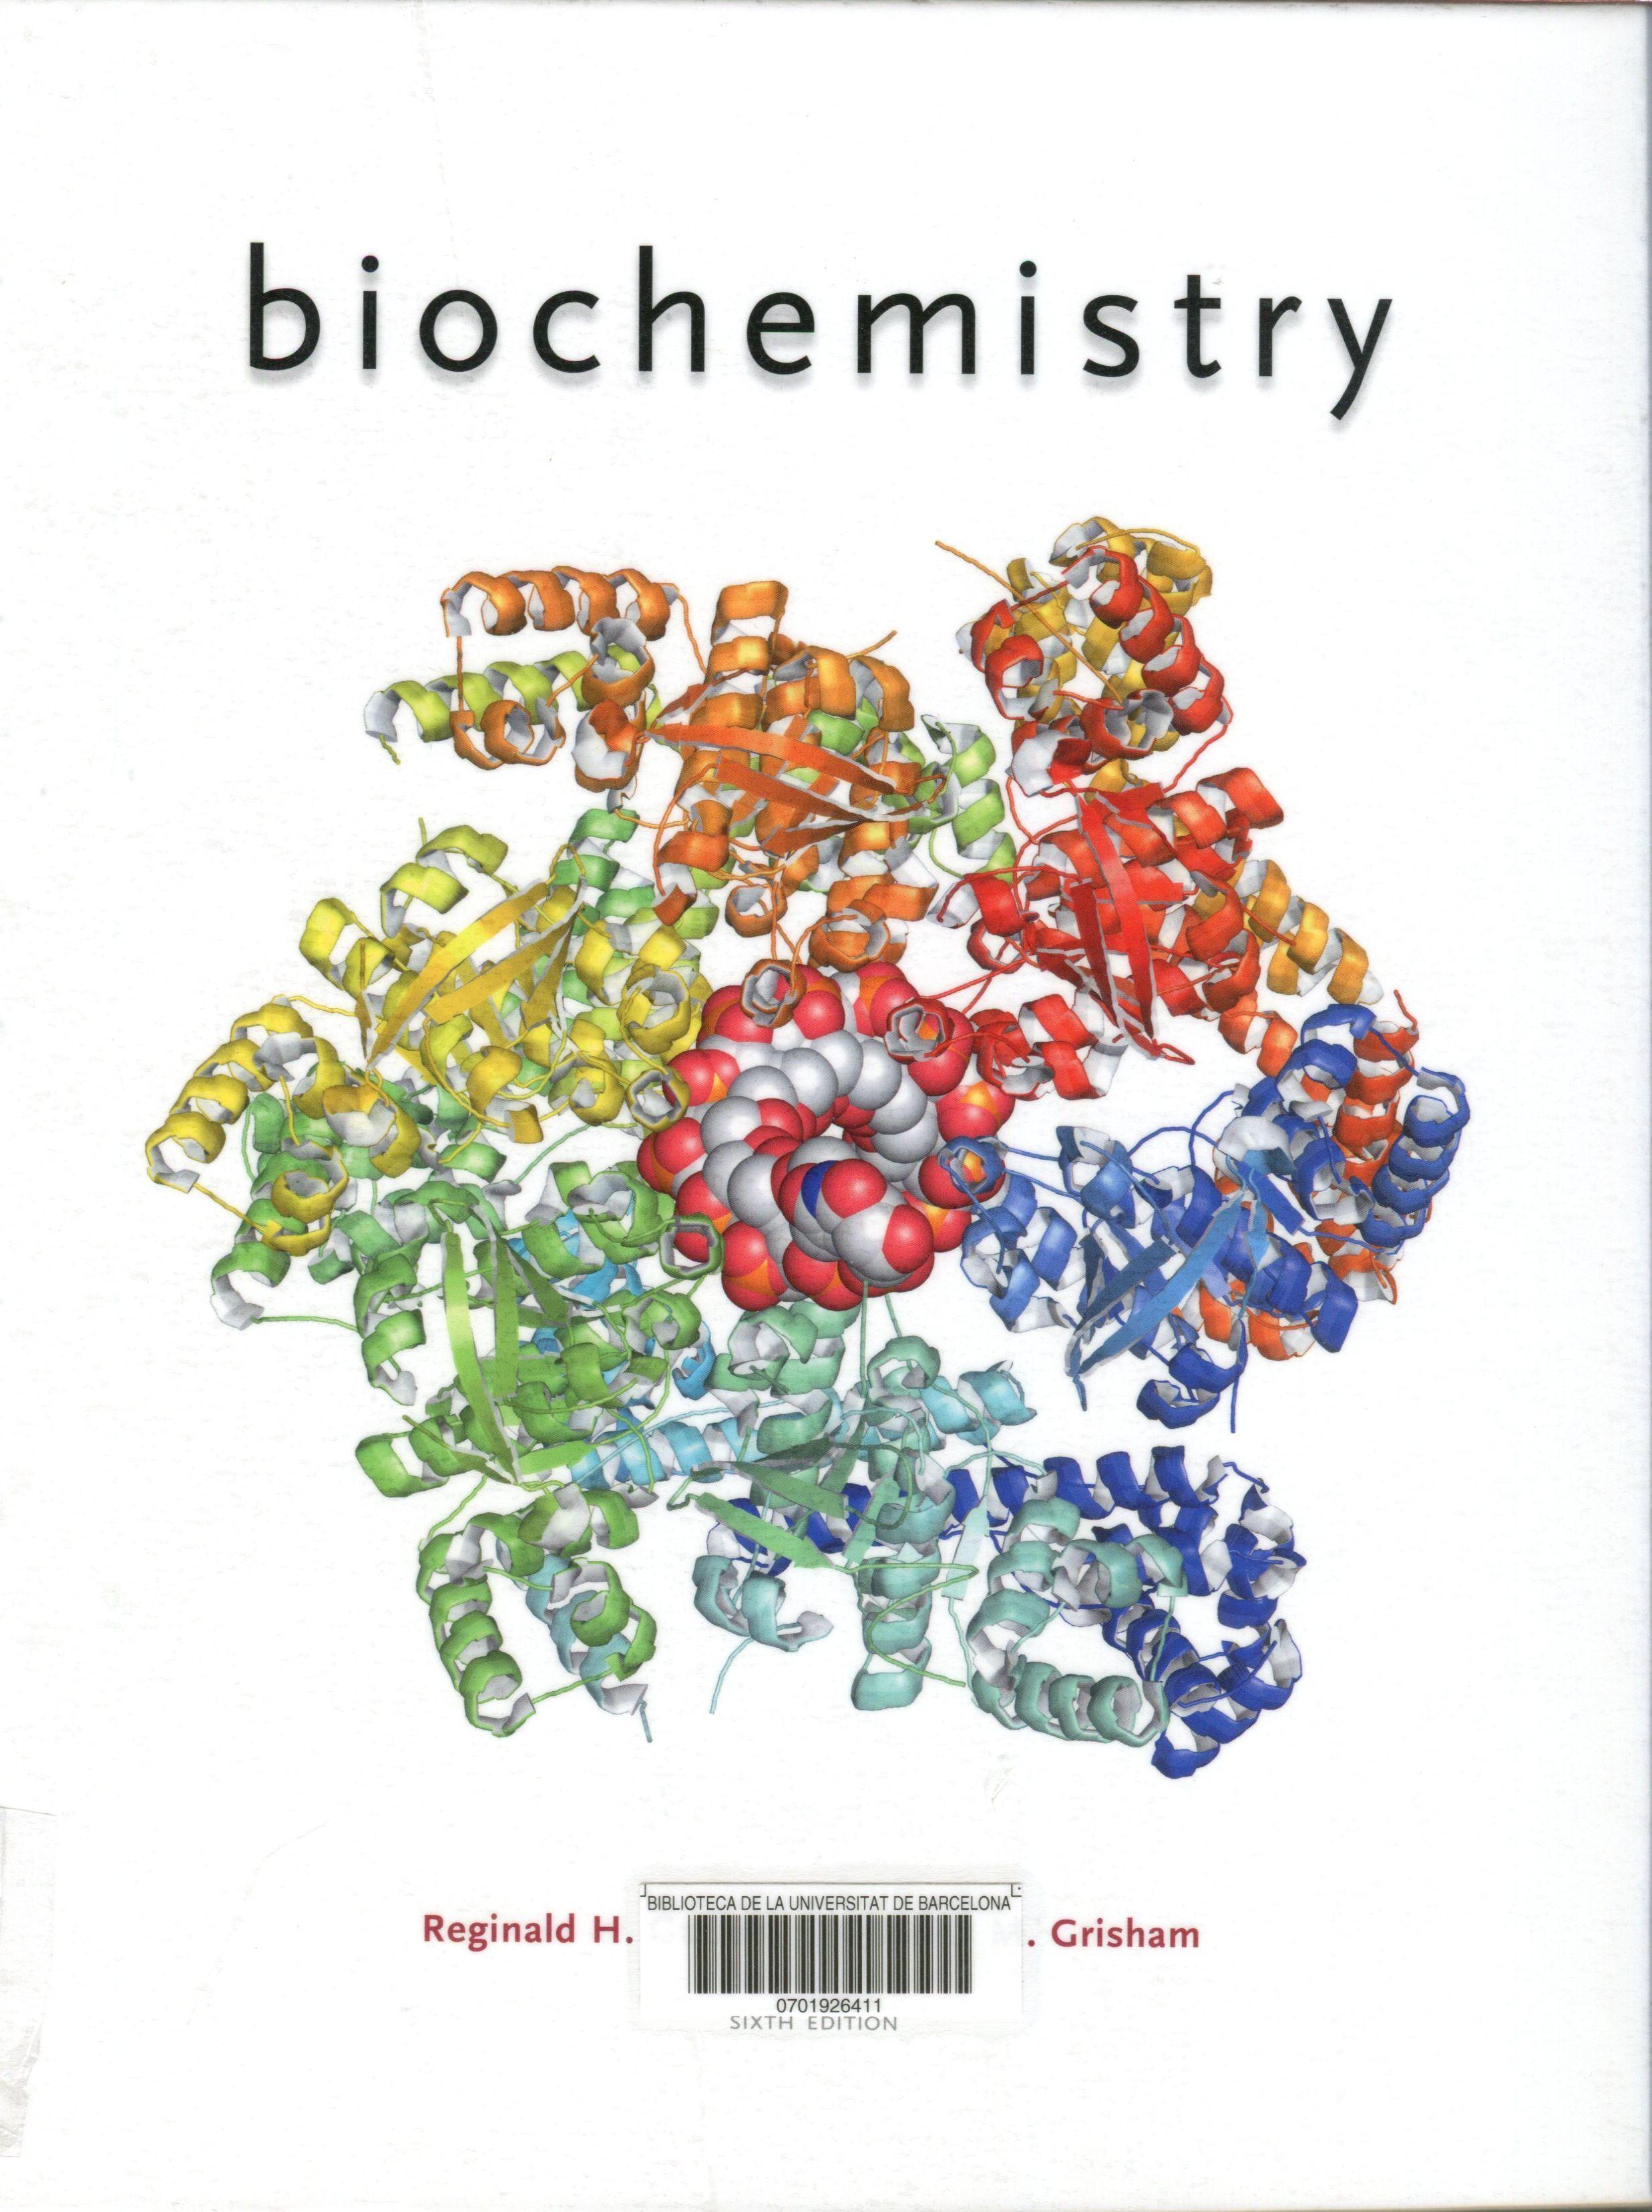 Biochemistry reginald h garrett charles m grisham university biochemistry reginald h garrett charles m grisham university of virginia fandeluxe Choice Image